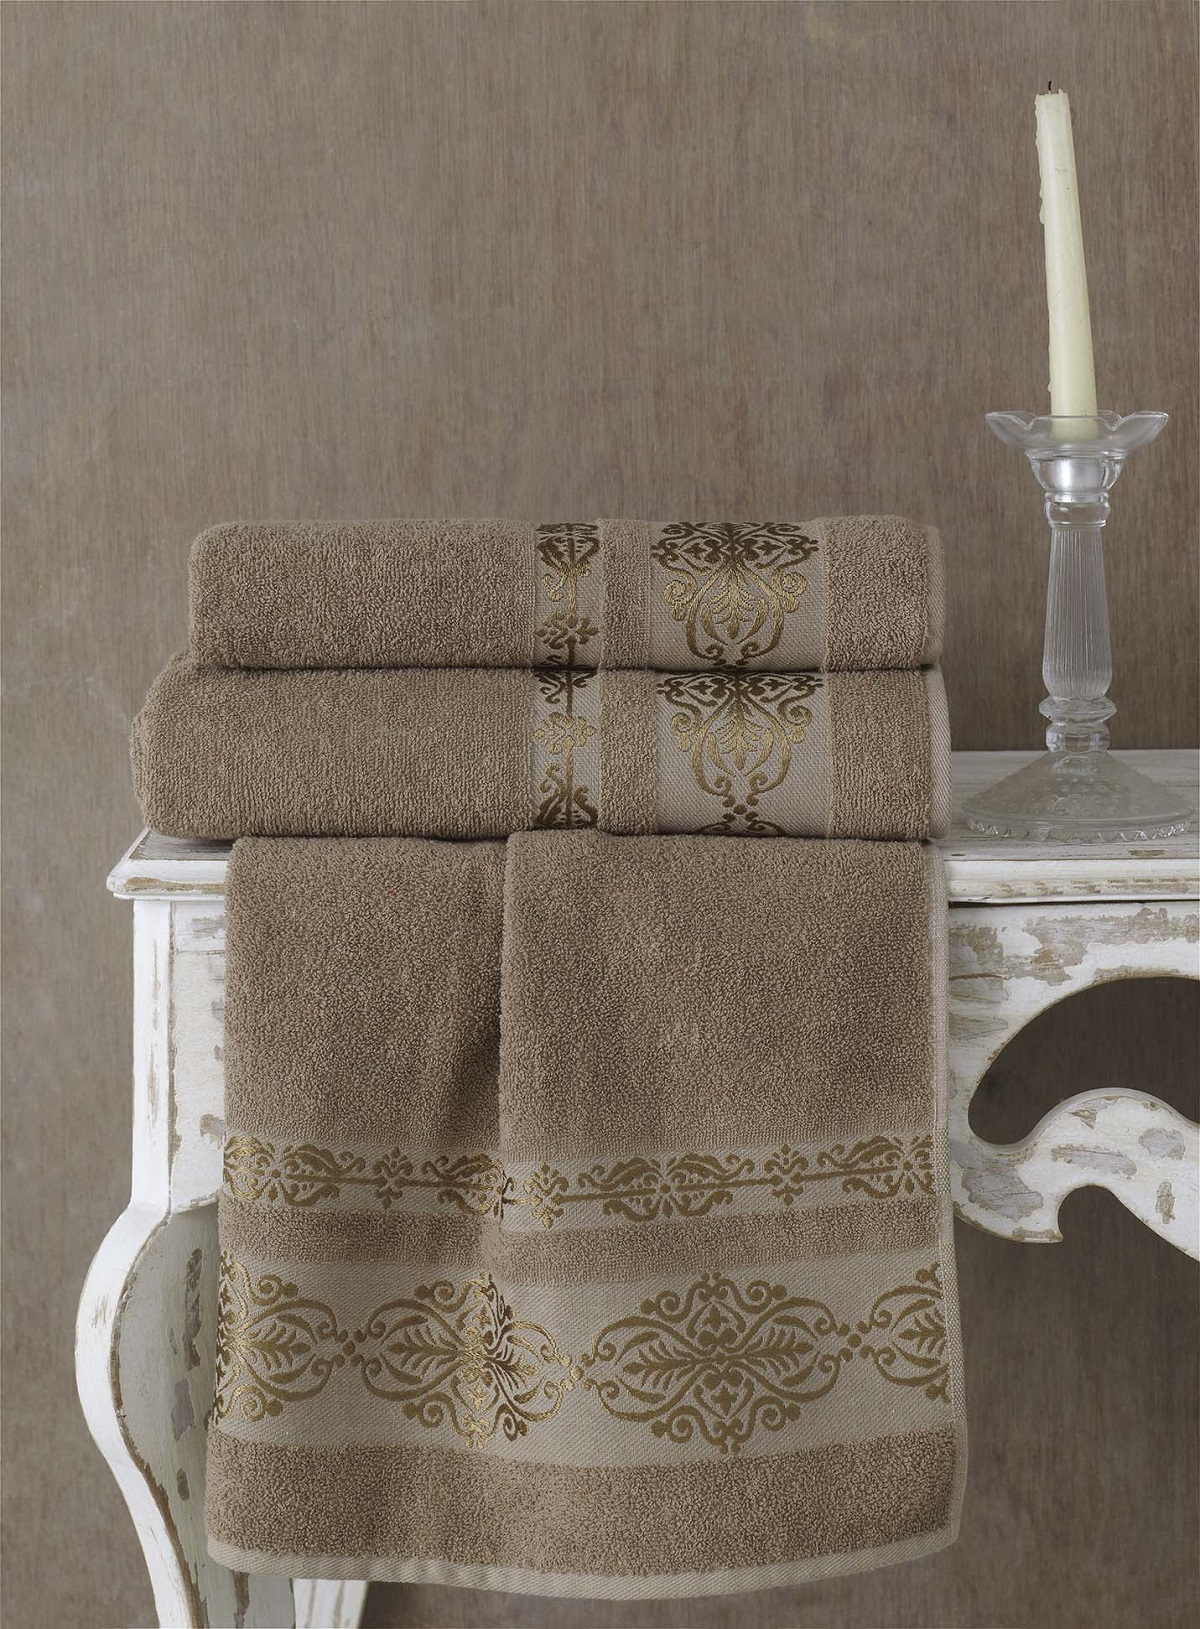 Полотенца Karna Полотенце Rebeka Цвет: Кофейный (70х140 см) полотенца karna полотенце iteka цвет коричневый 70х140 см